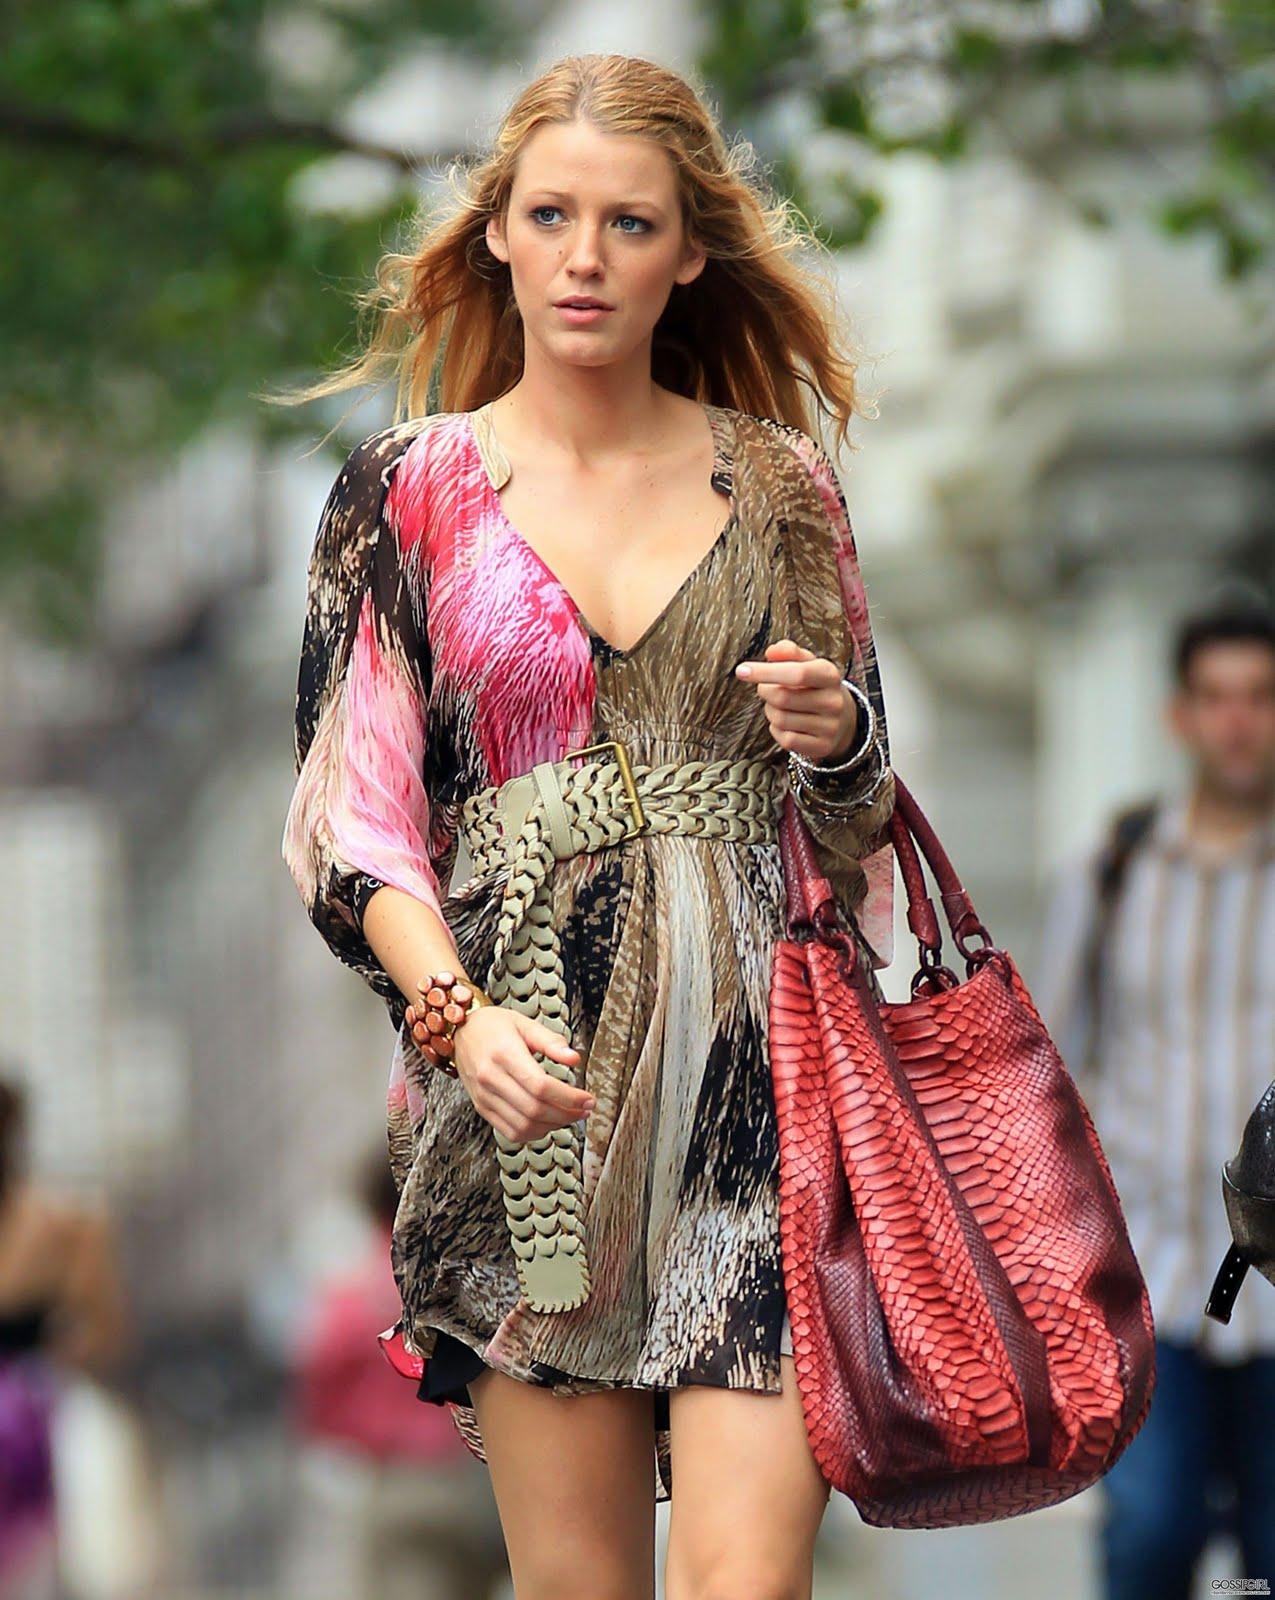 iloveluci: Street Style Muse: Serena Van Der Woodsen